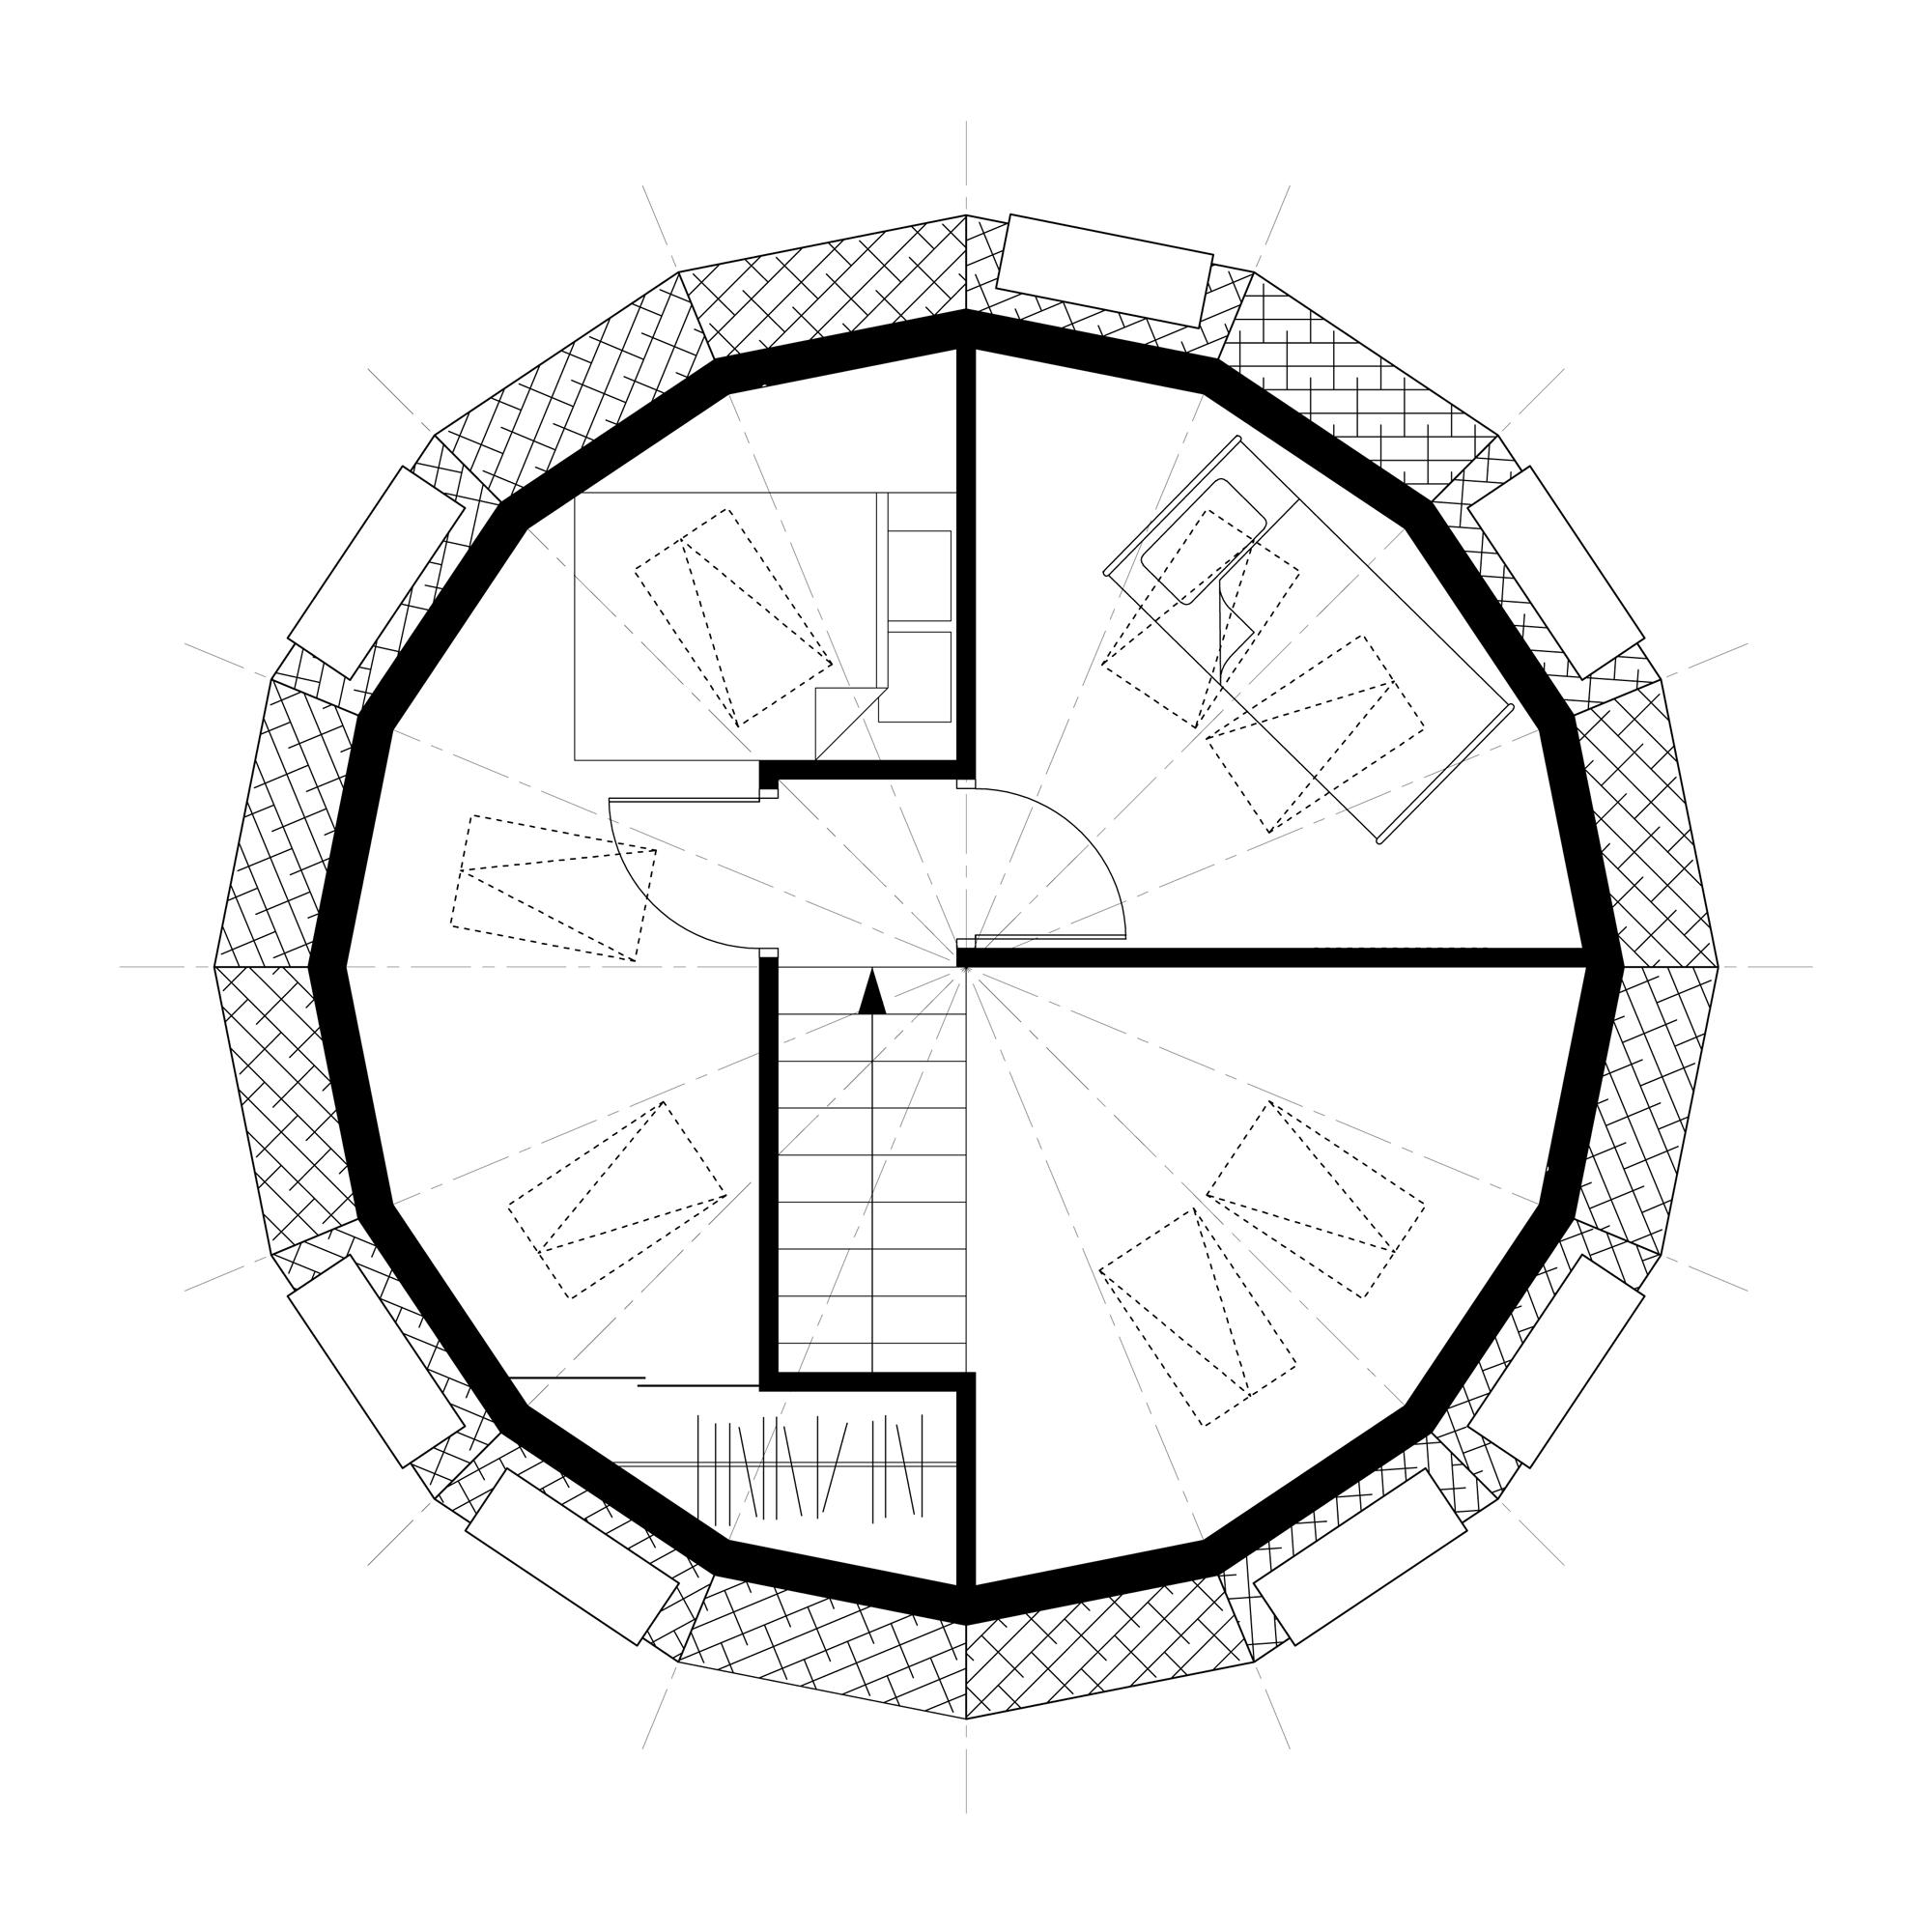 dom-sfera-v-permi-planirovka.png - 463.72 kB